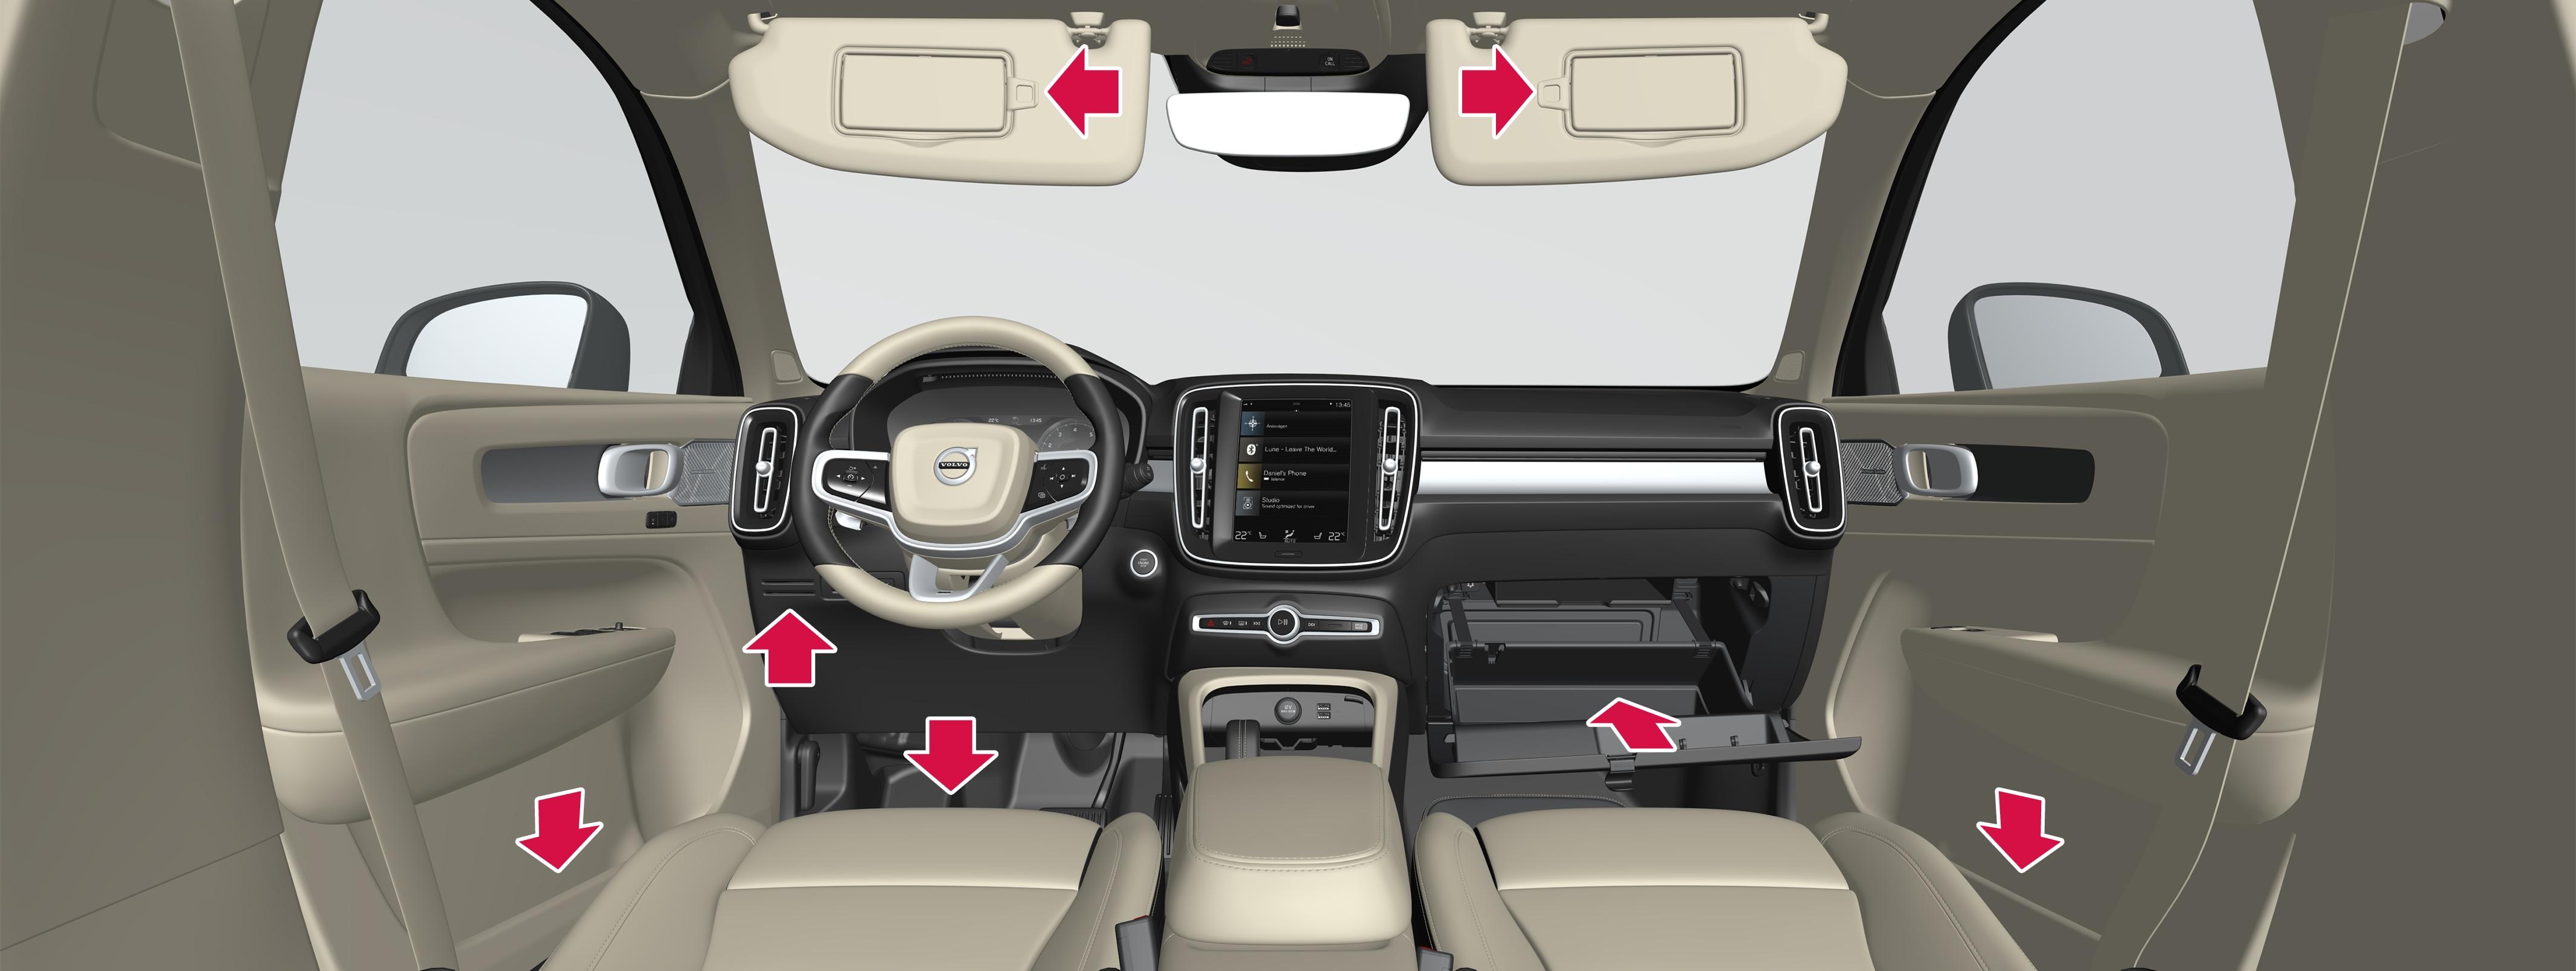 P6-1746-XC40-Interior storage, front seat